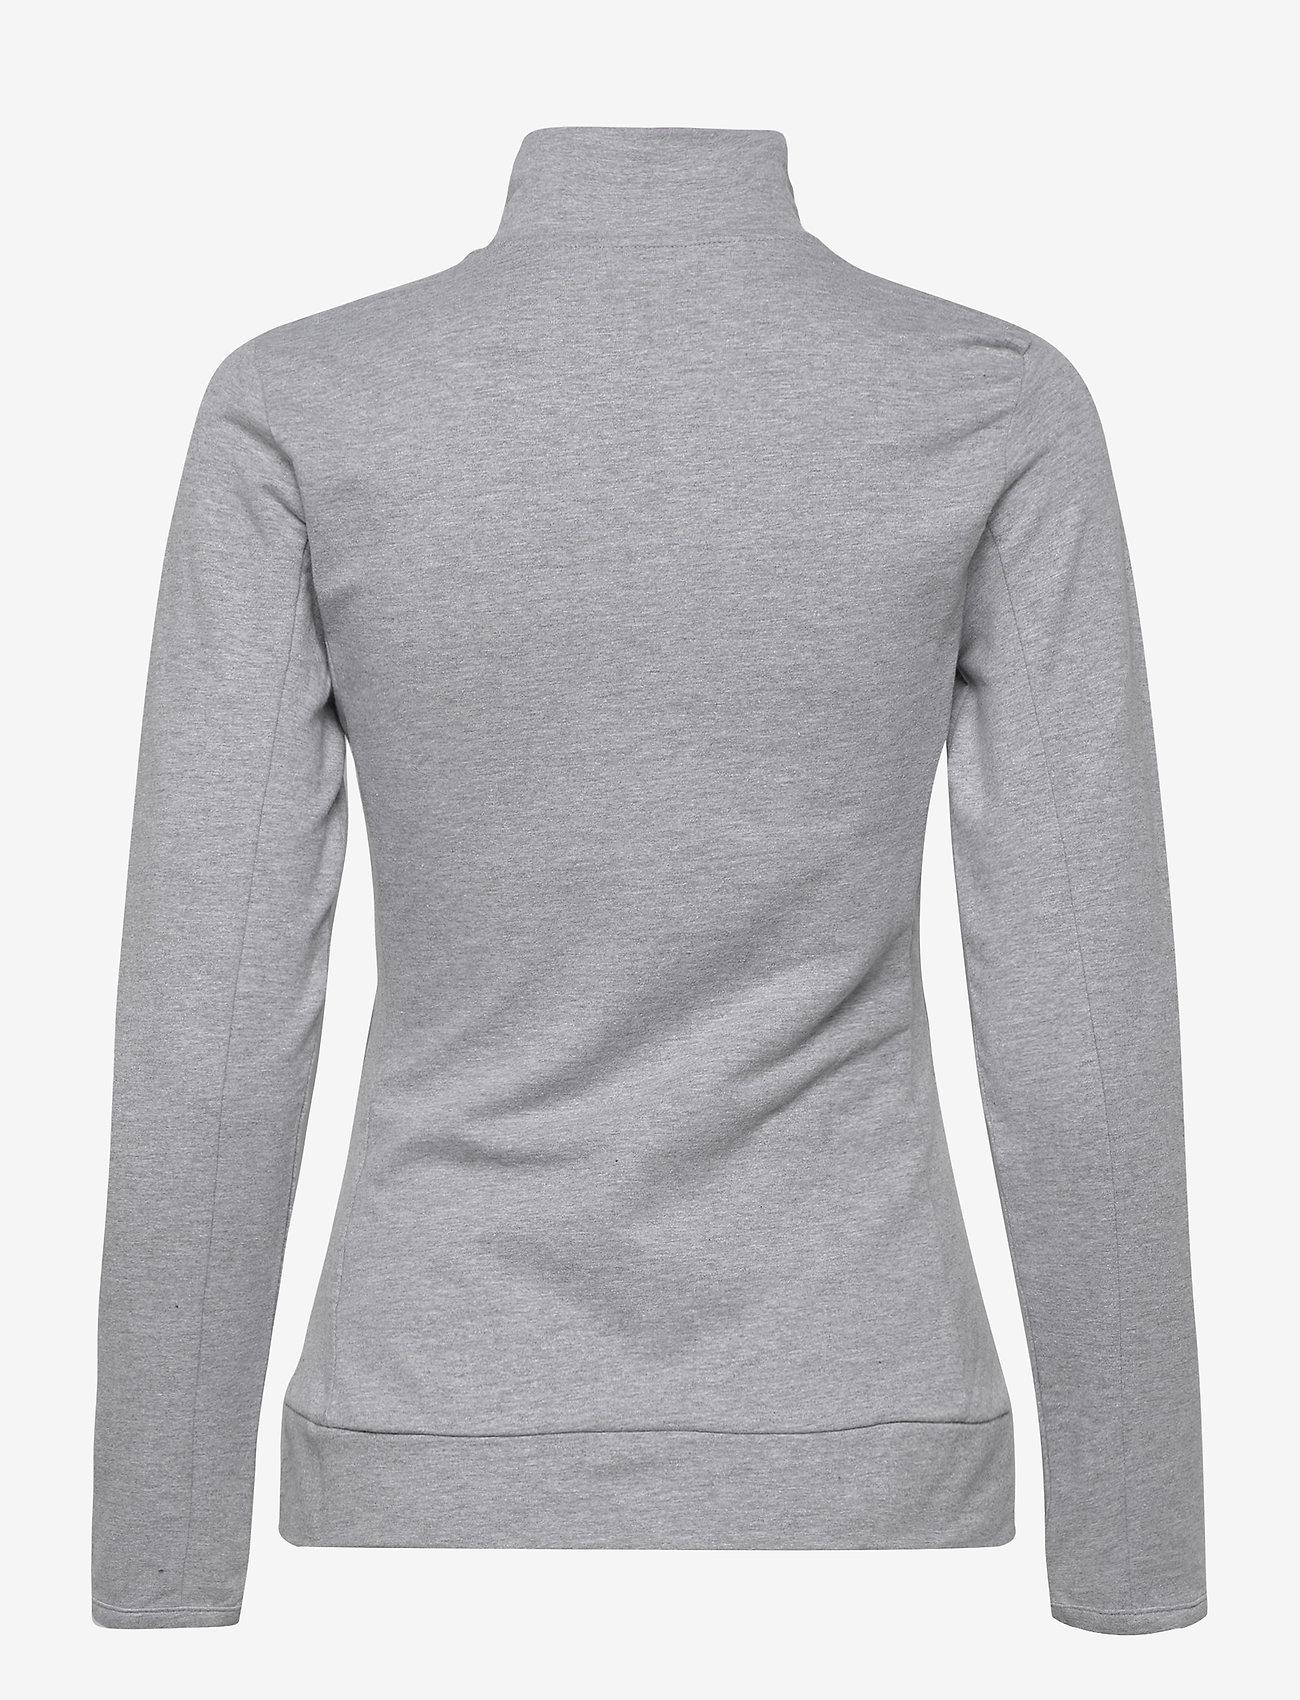 Björn Borg - JACKET FLAVIA FLAVIA - sweatshirts - h108by light grey melange - 1